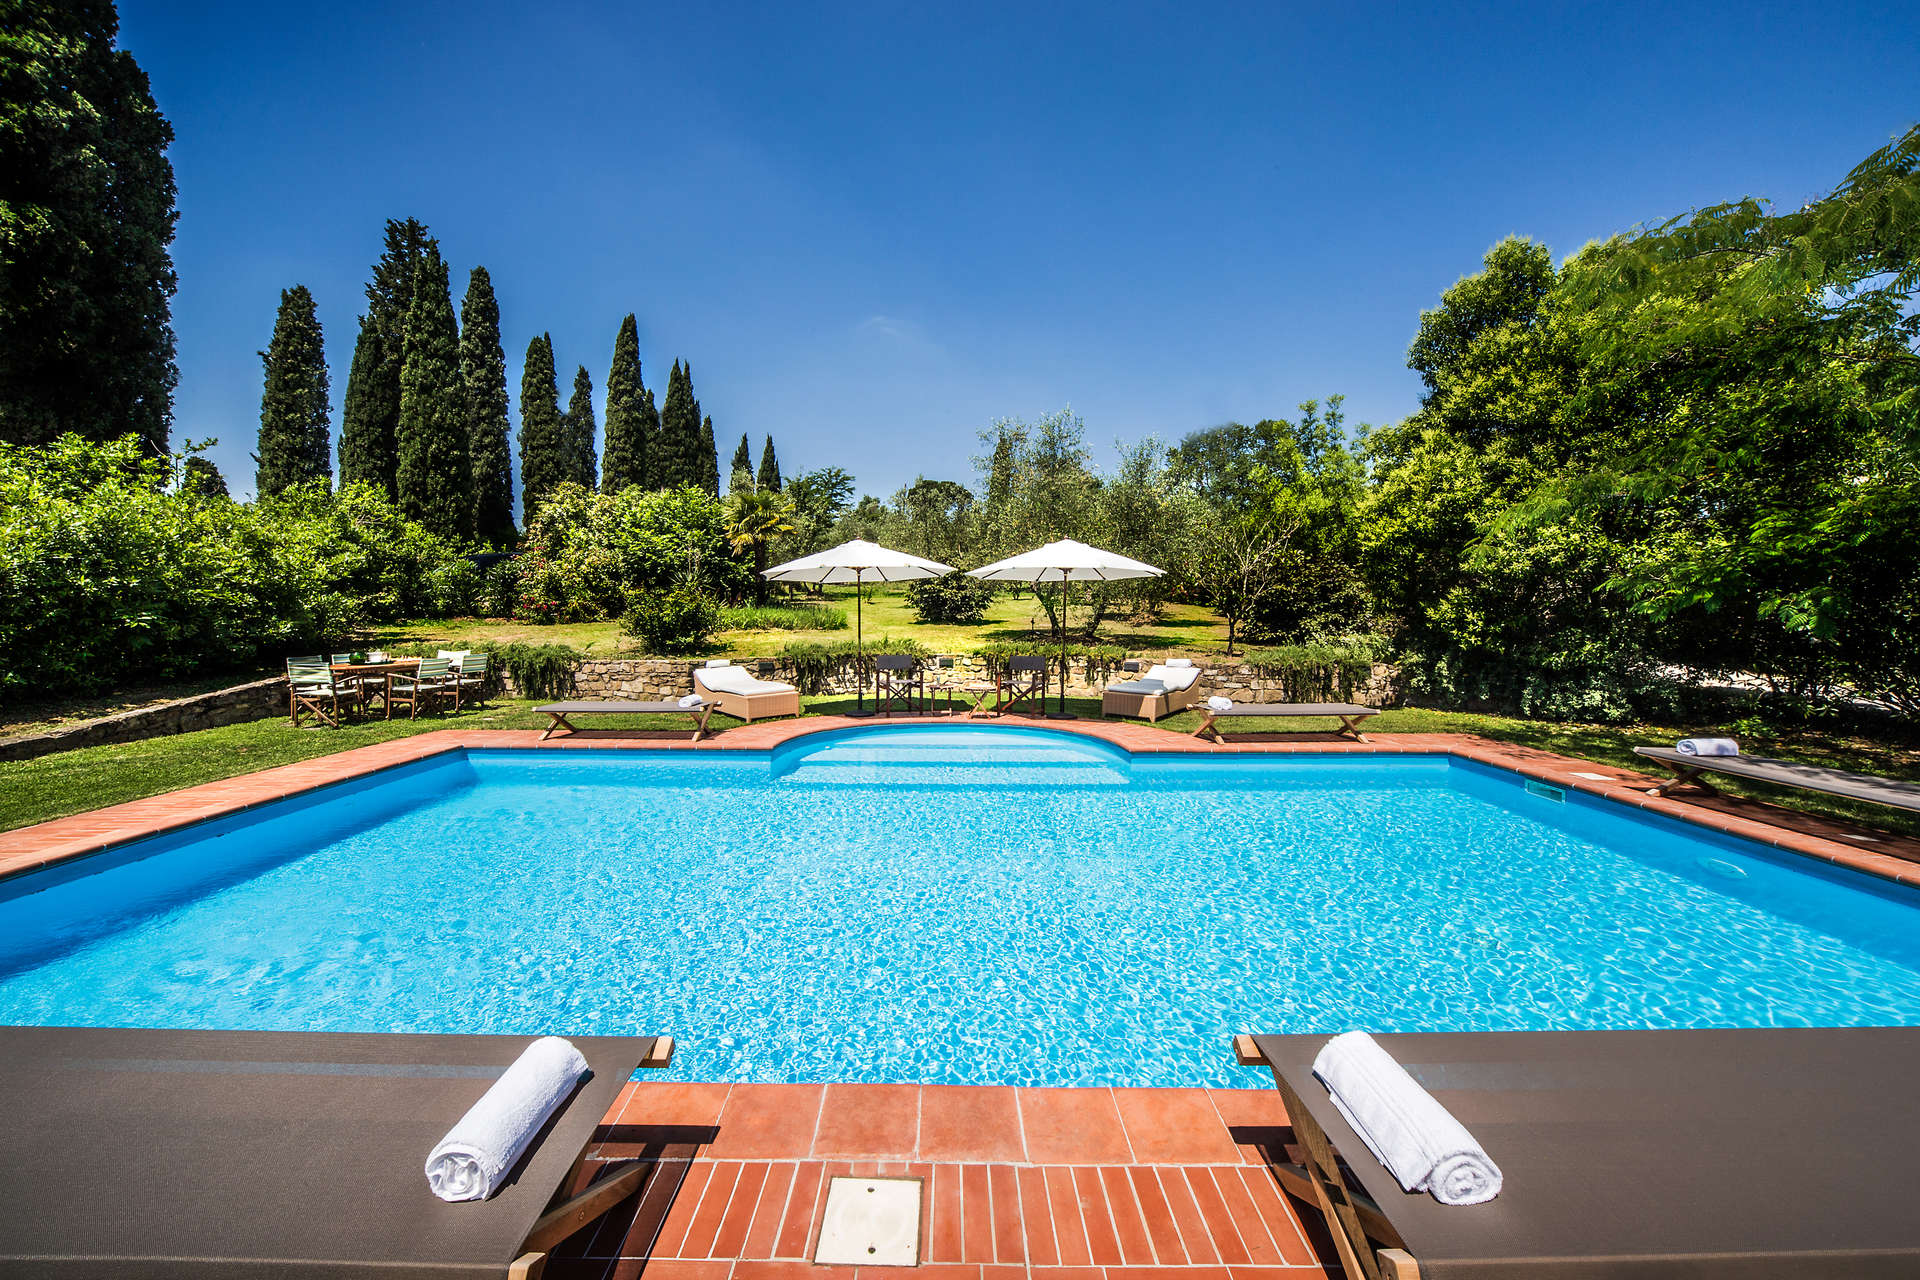 Luxury vacation rentals europe - Italy - Tuscany - Florence - Duca - Image 1/19